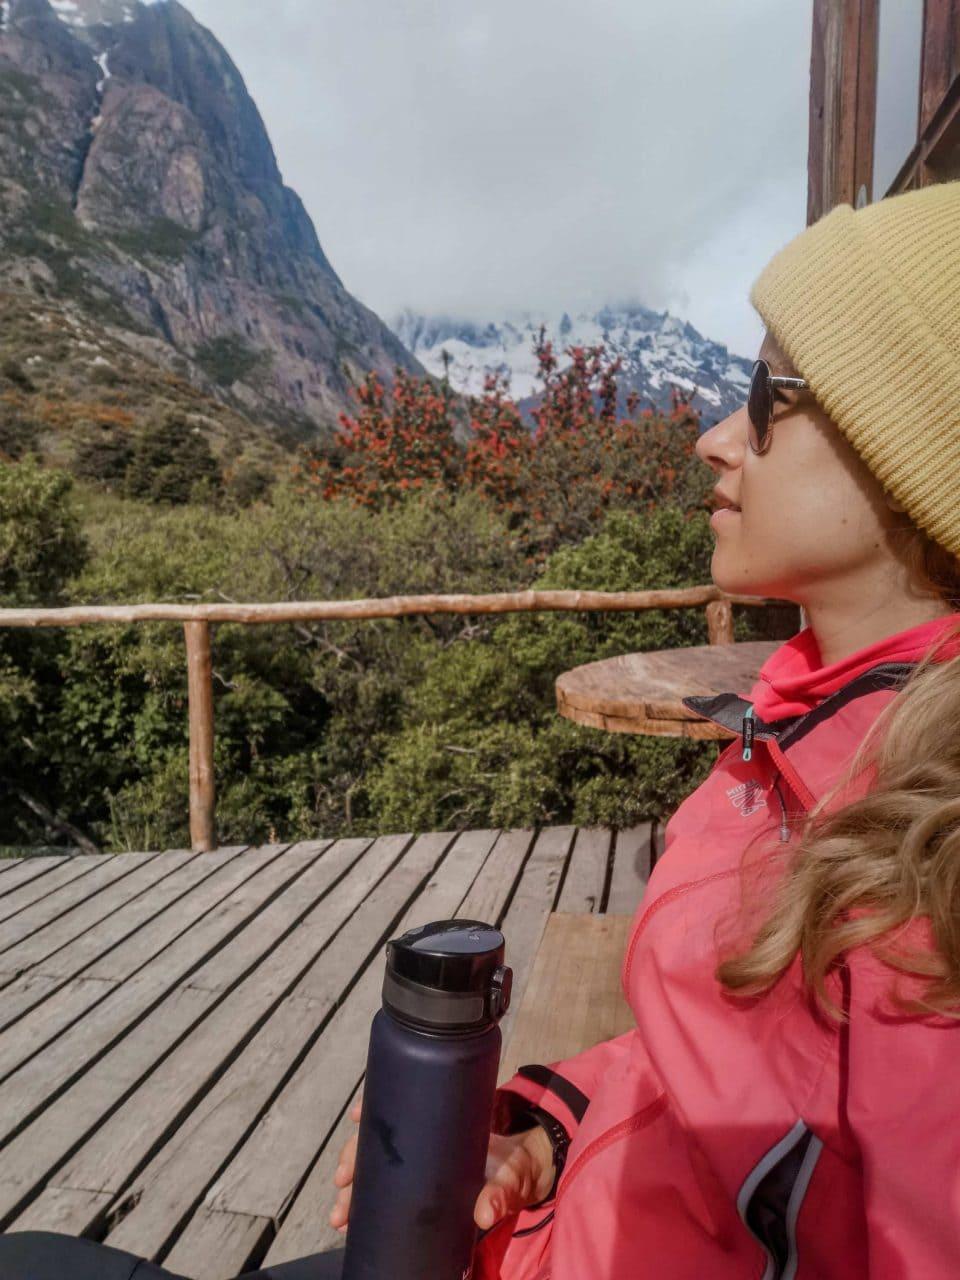 Campingplatz Cuernos Torres del Paine Nationalpark Patagonien